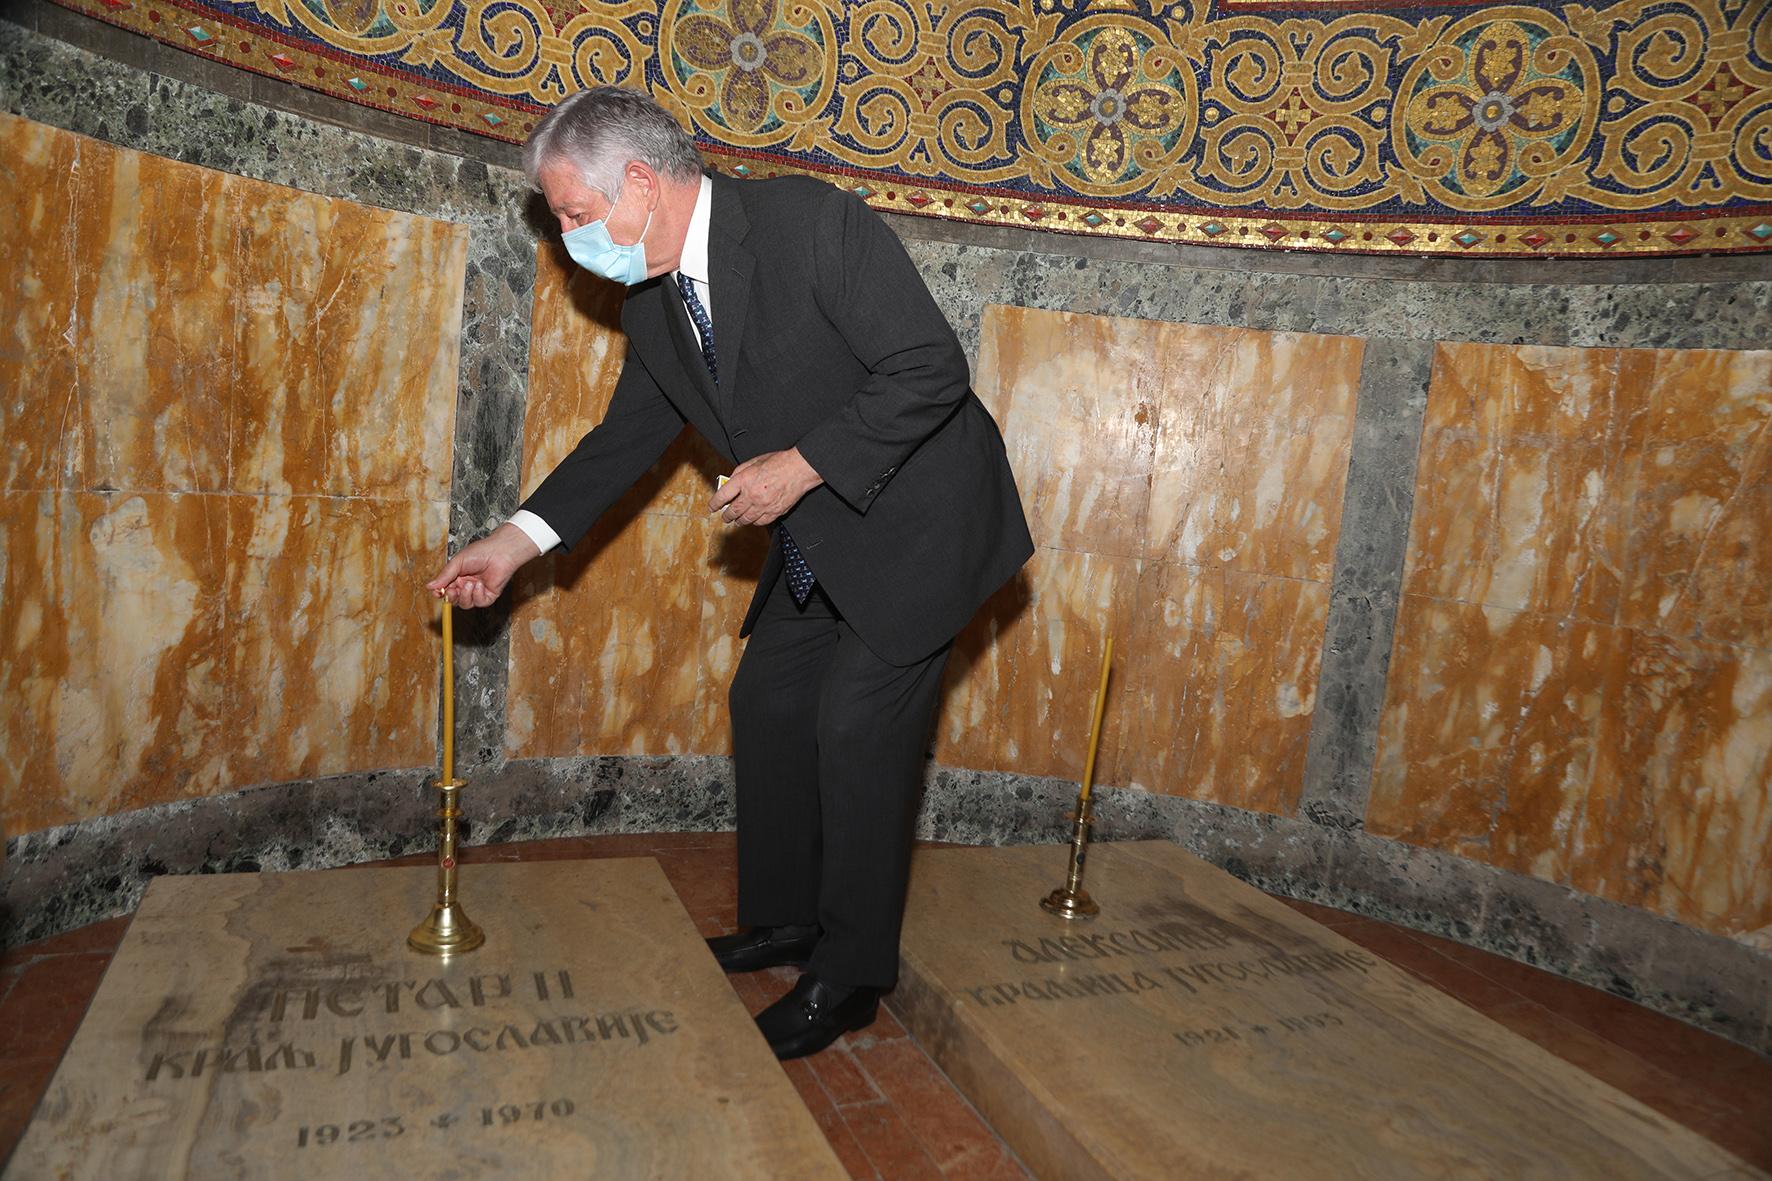 Nj.K.V. Prestolonaslednik Aleksandar pali sveću na grobu svog oca, Nj.V. Kralja Petra II